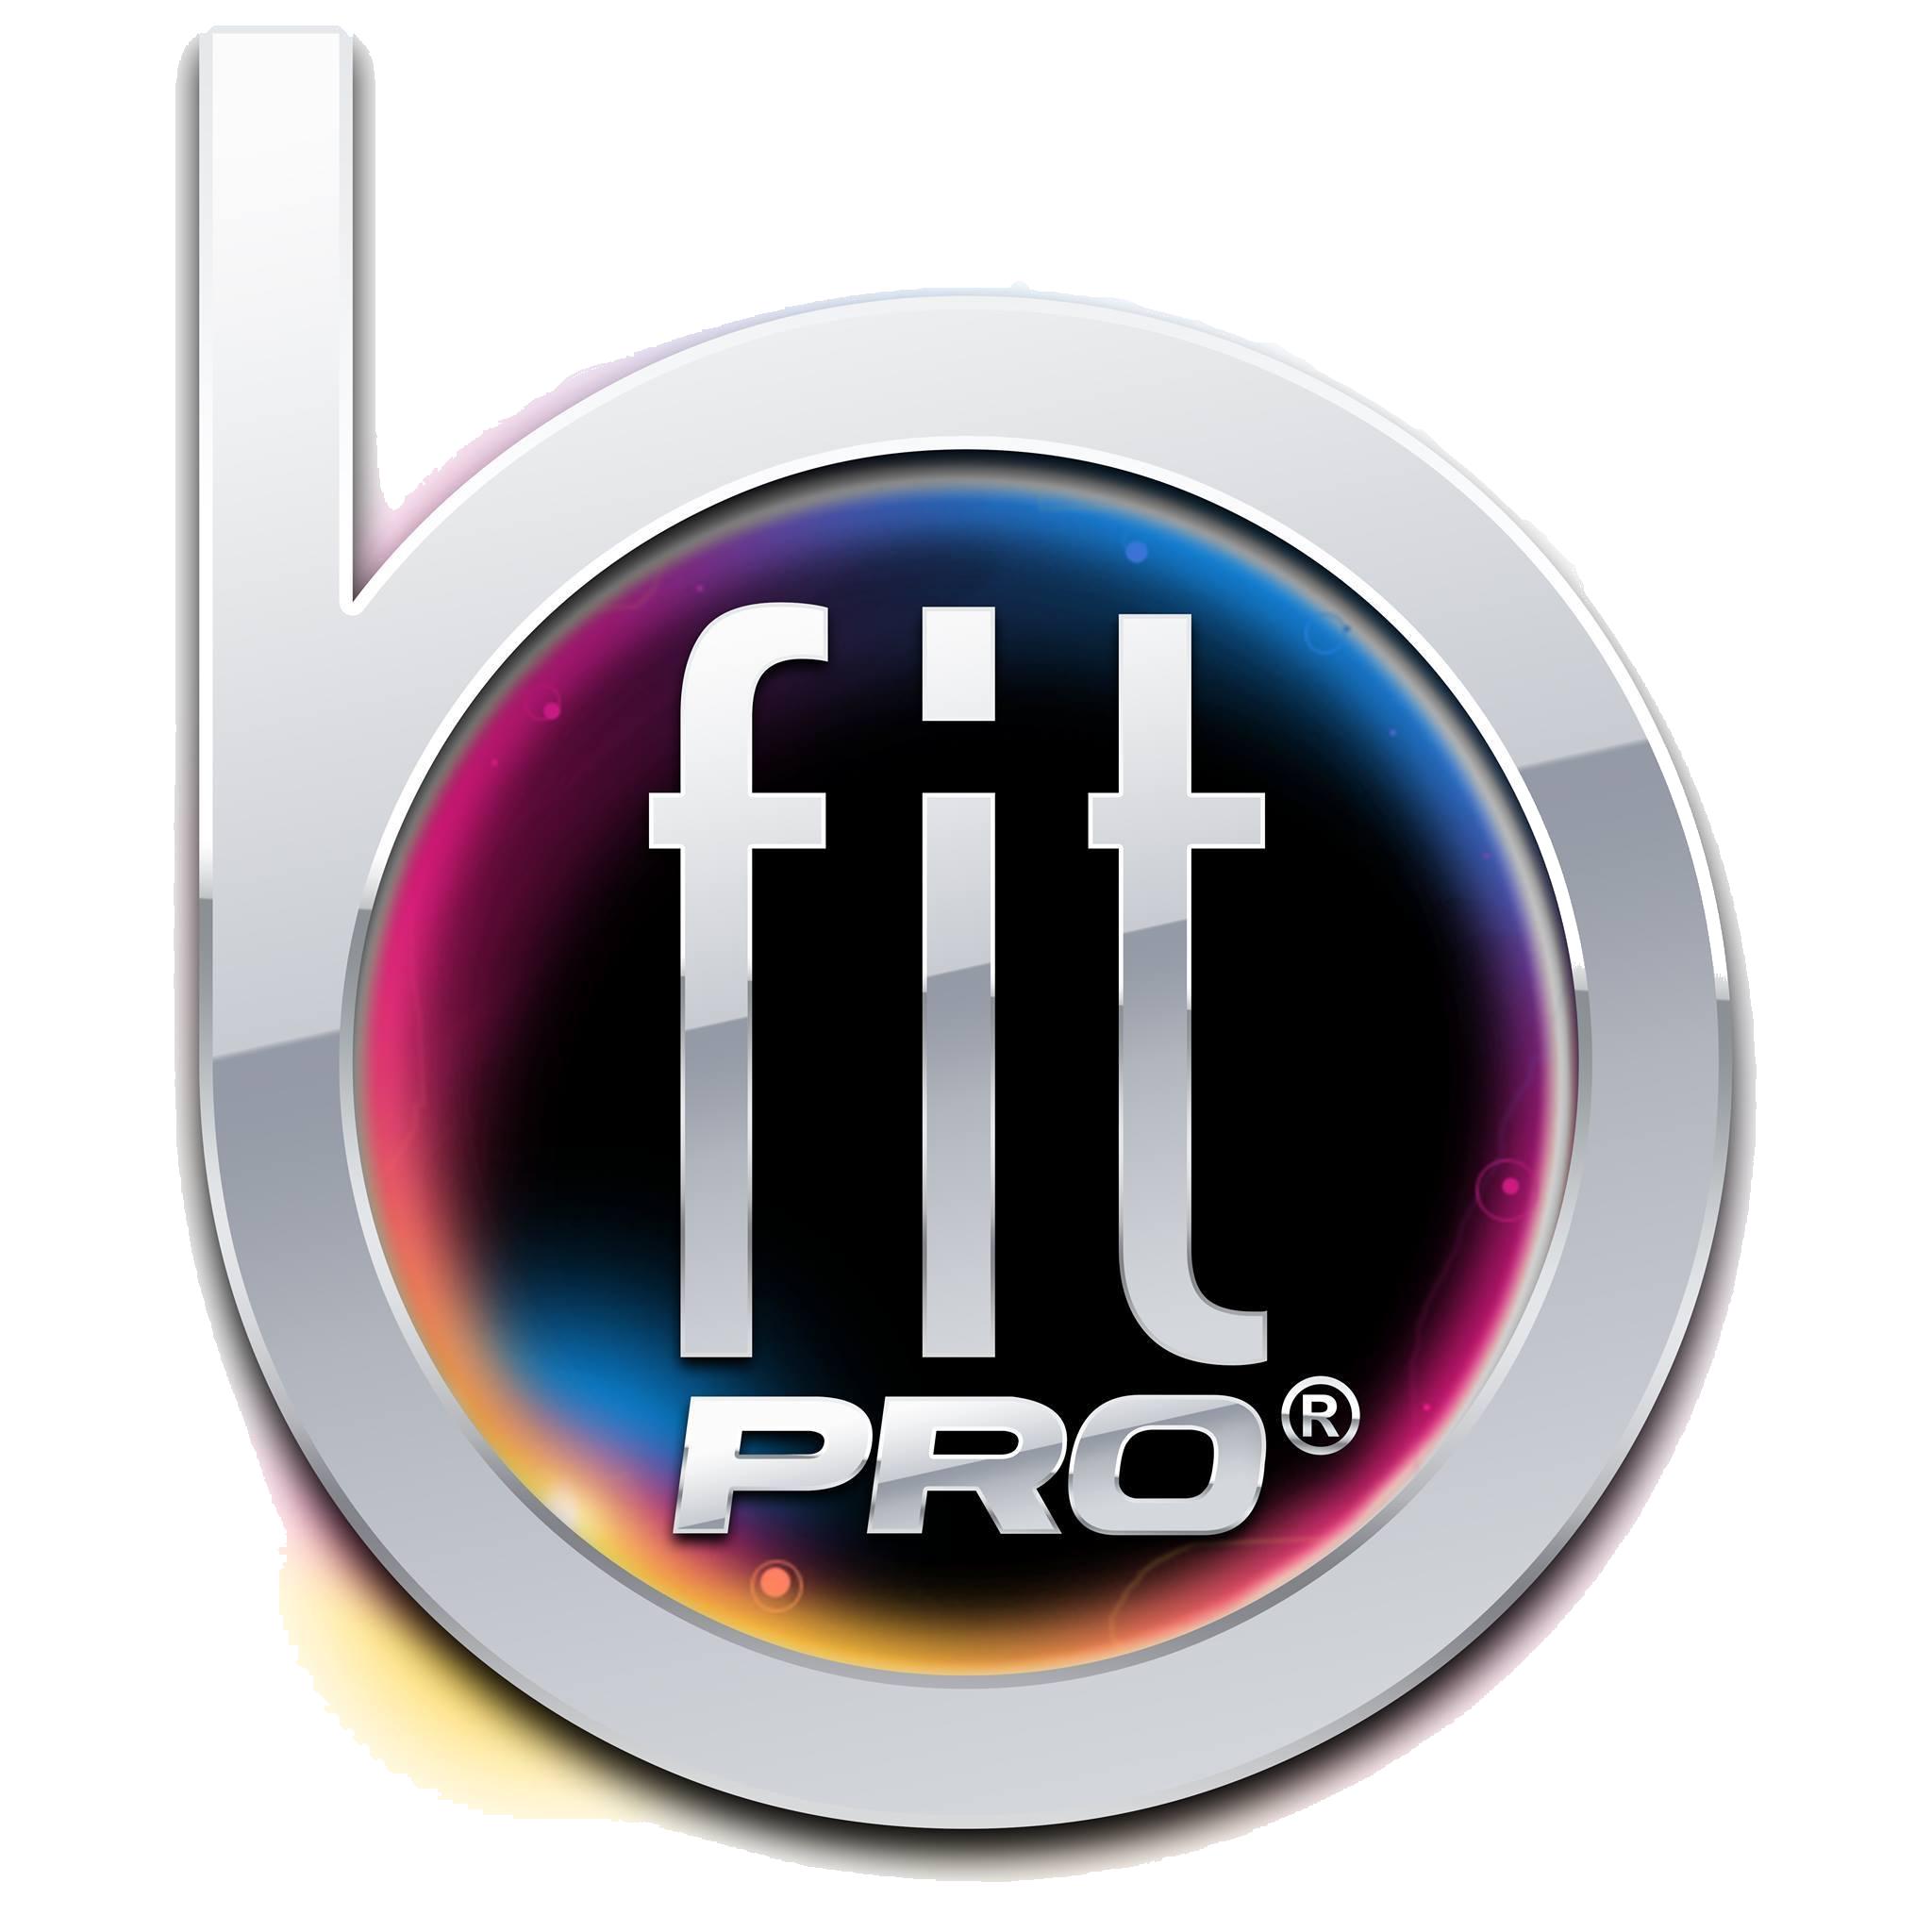 """ Bfit Pro Black Edition """